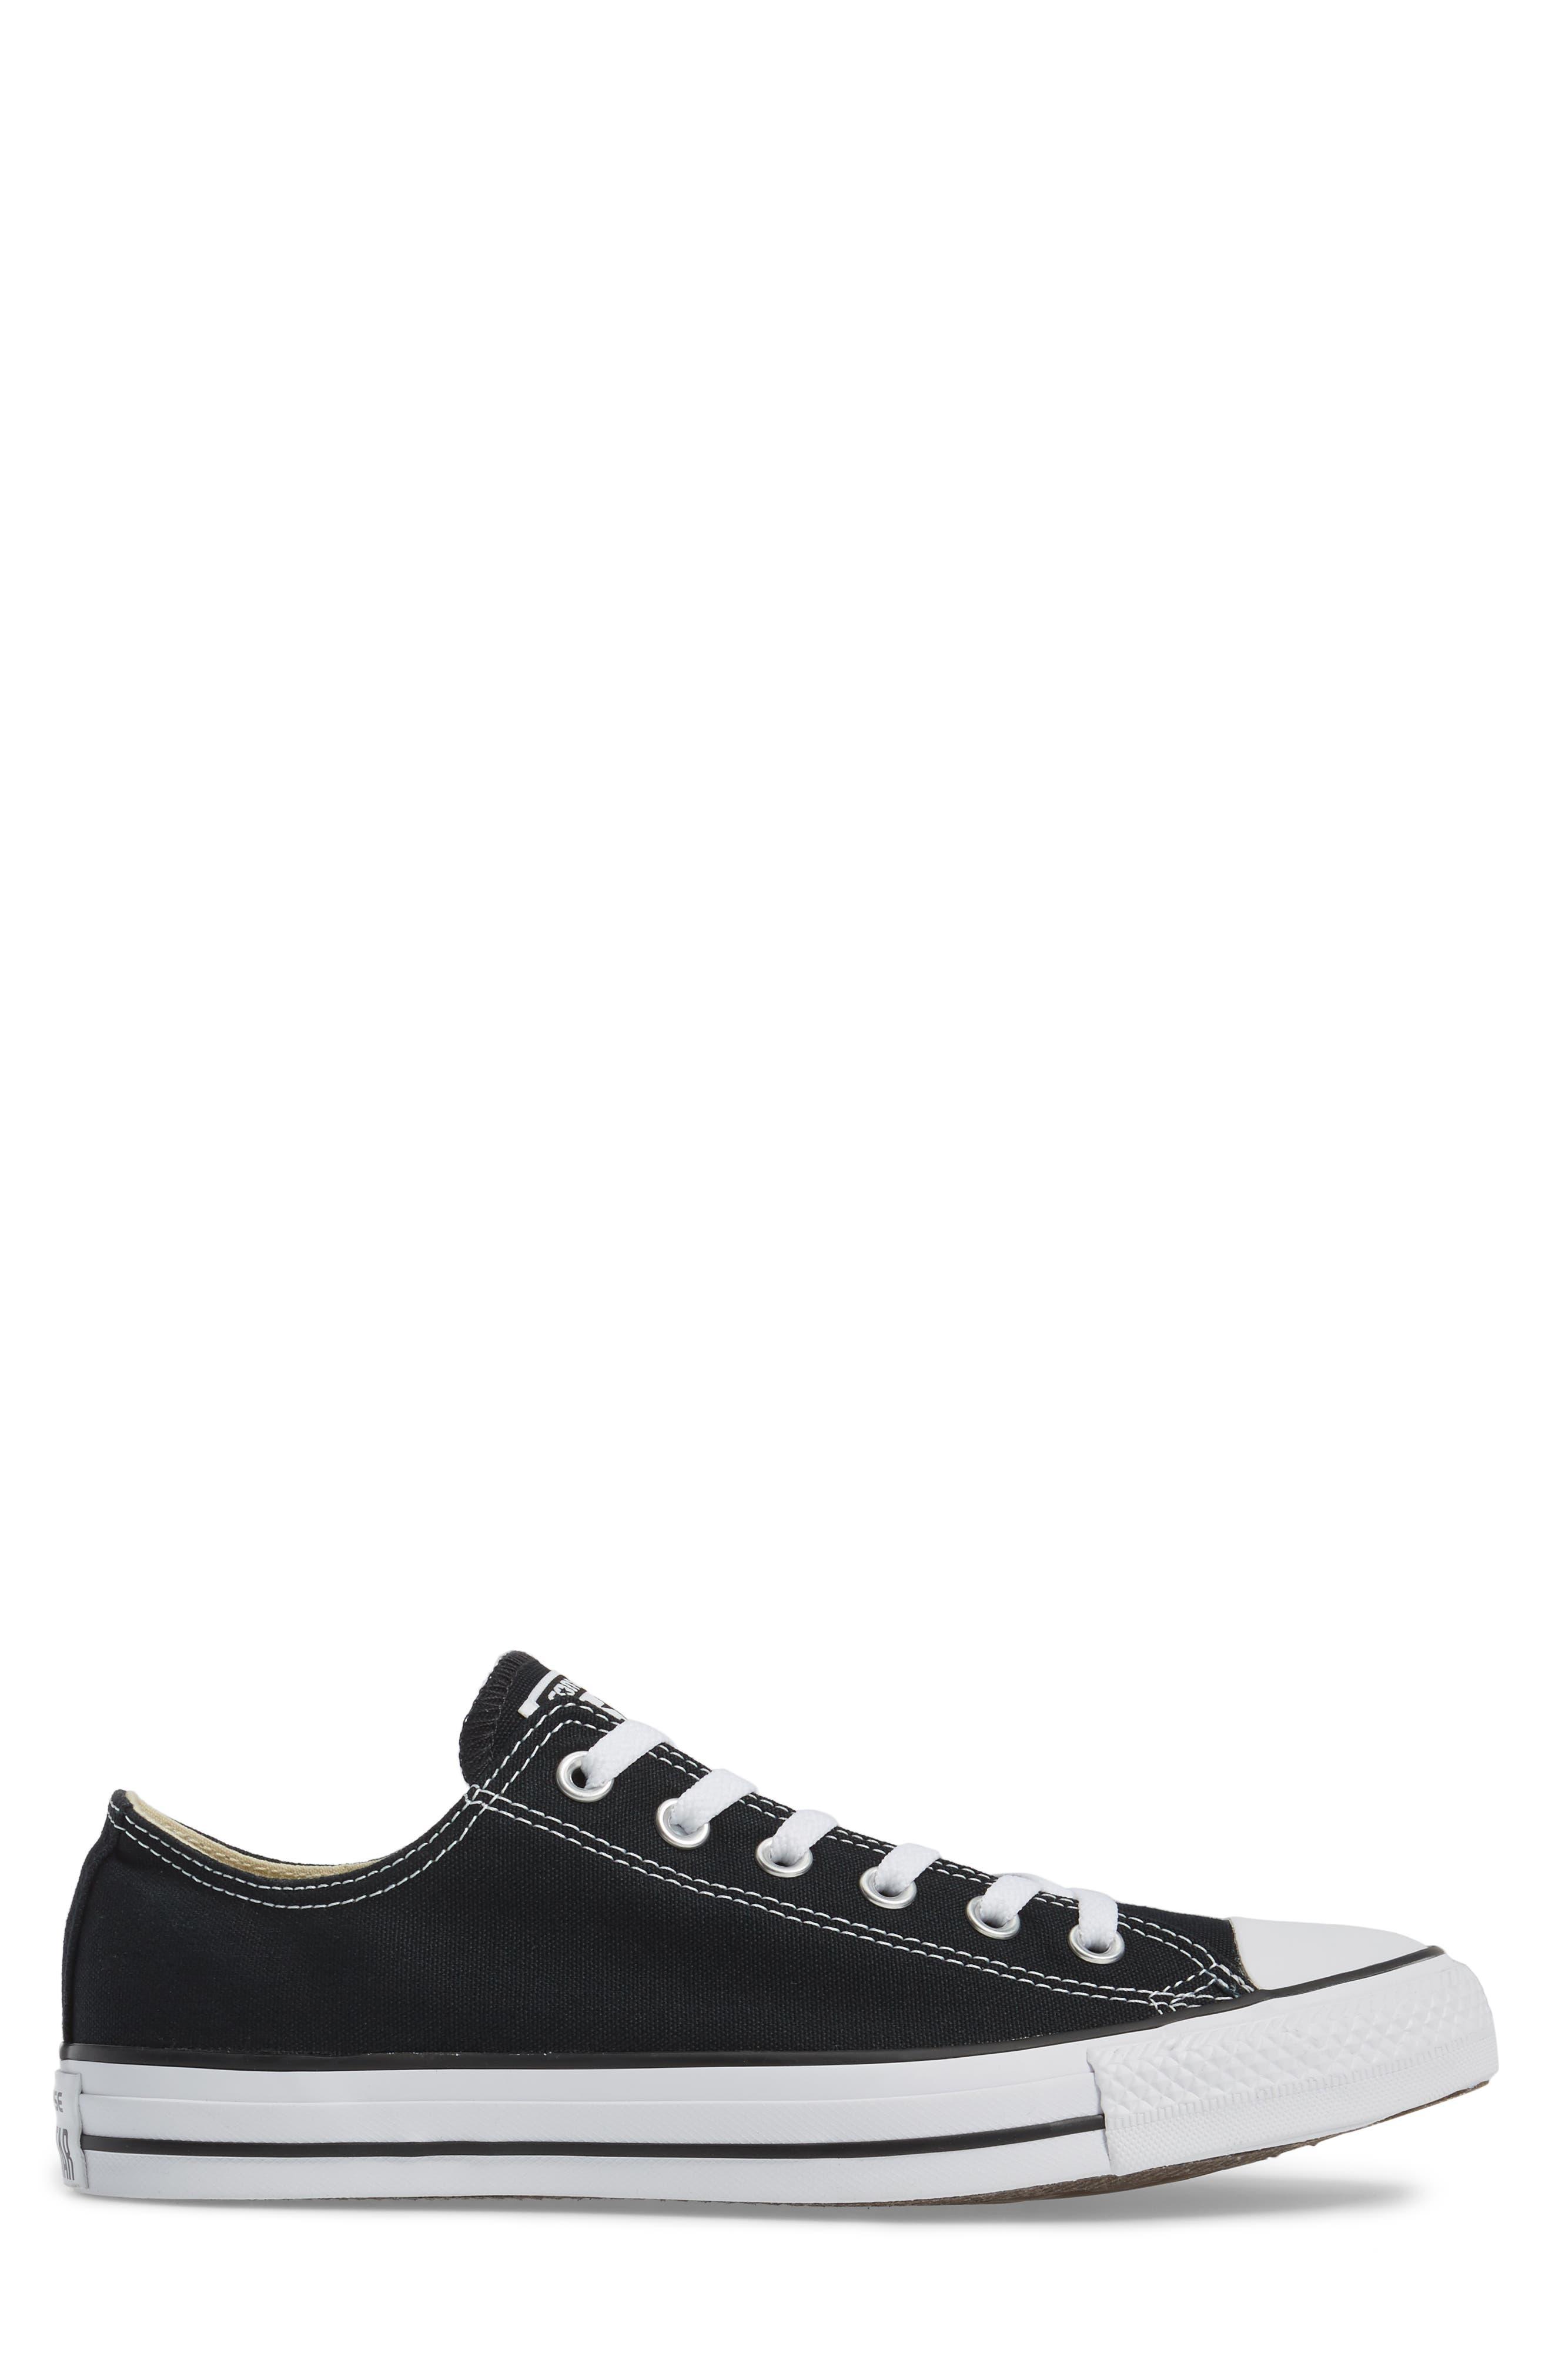 CONVERSE, Chuck Taylor<sup>®</sup> Low Sneaker, Alternate thumbnail 3, color, BLACK